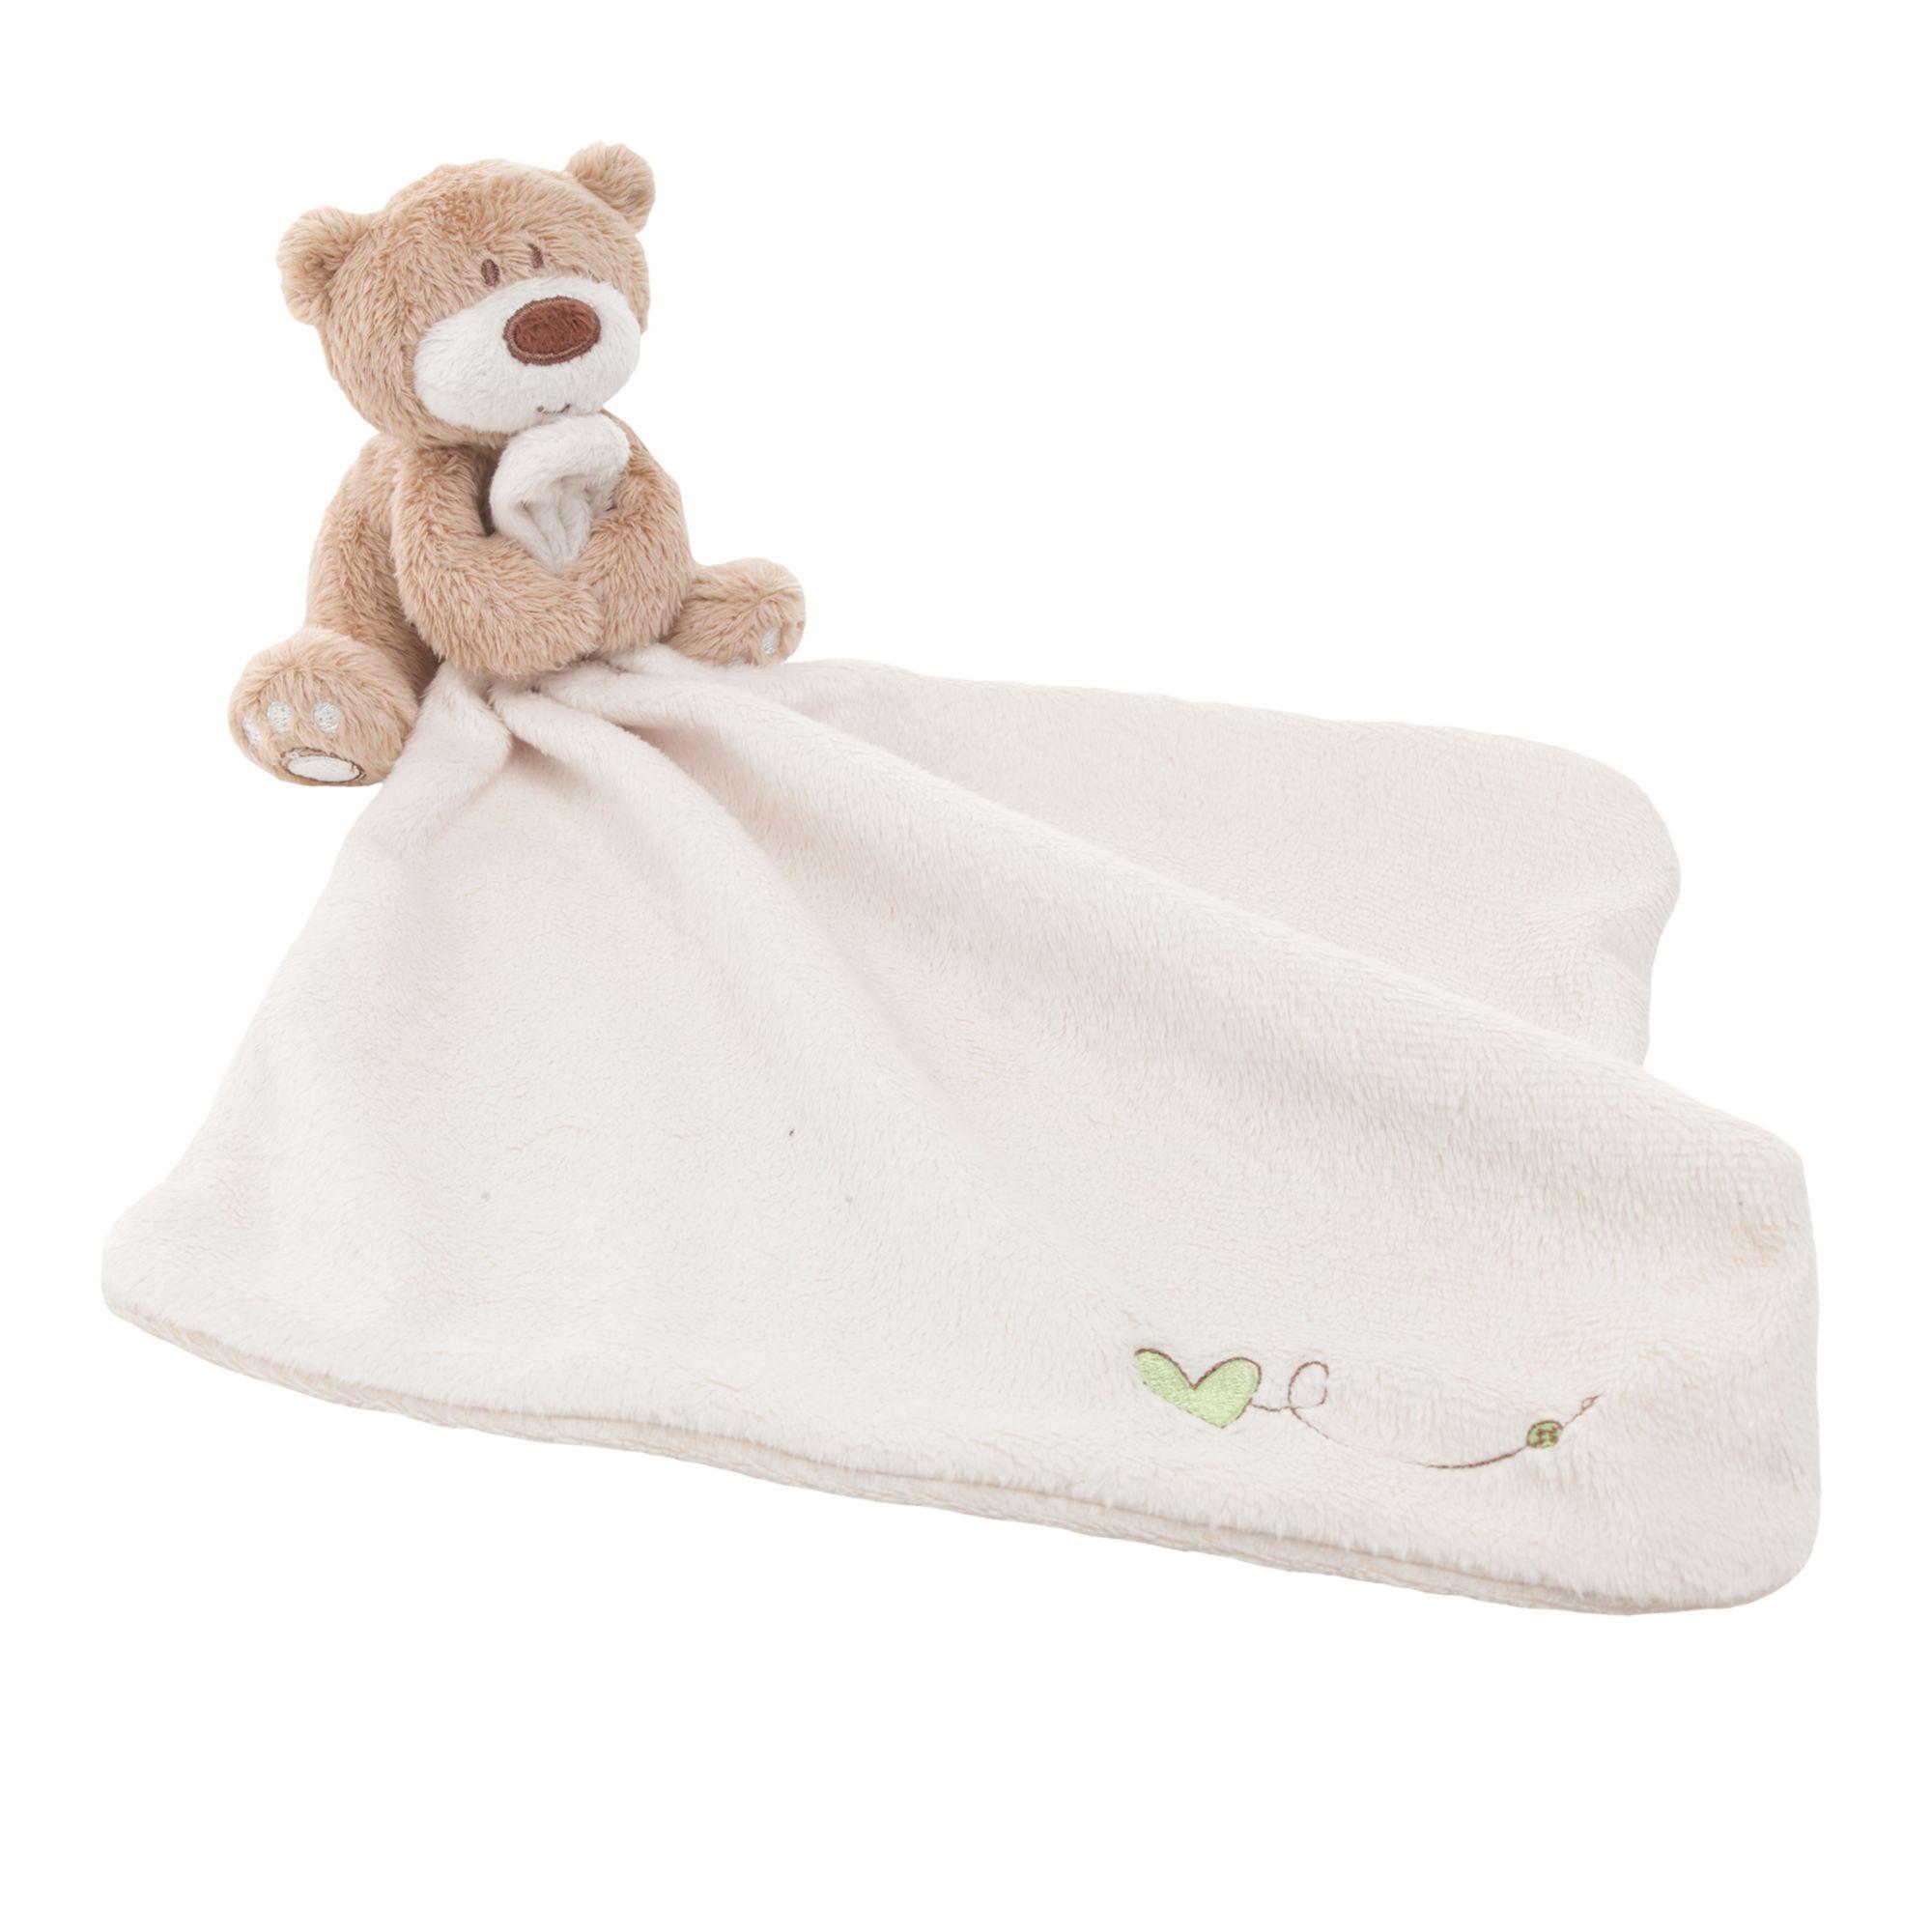 1*Cute Bear Blankie Development Soft Toy Newborn Gift For Baby Kids 2018